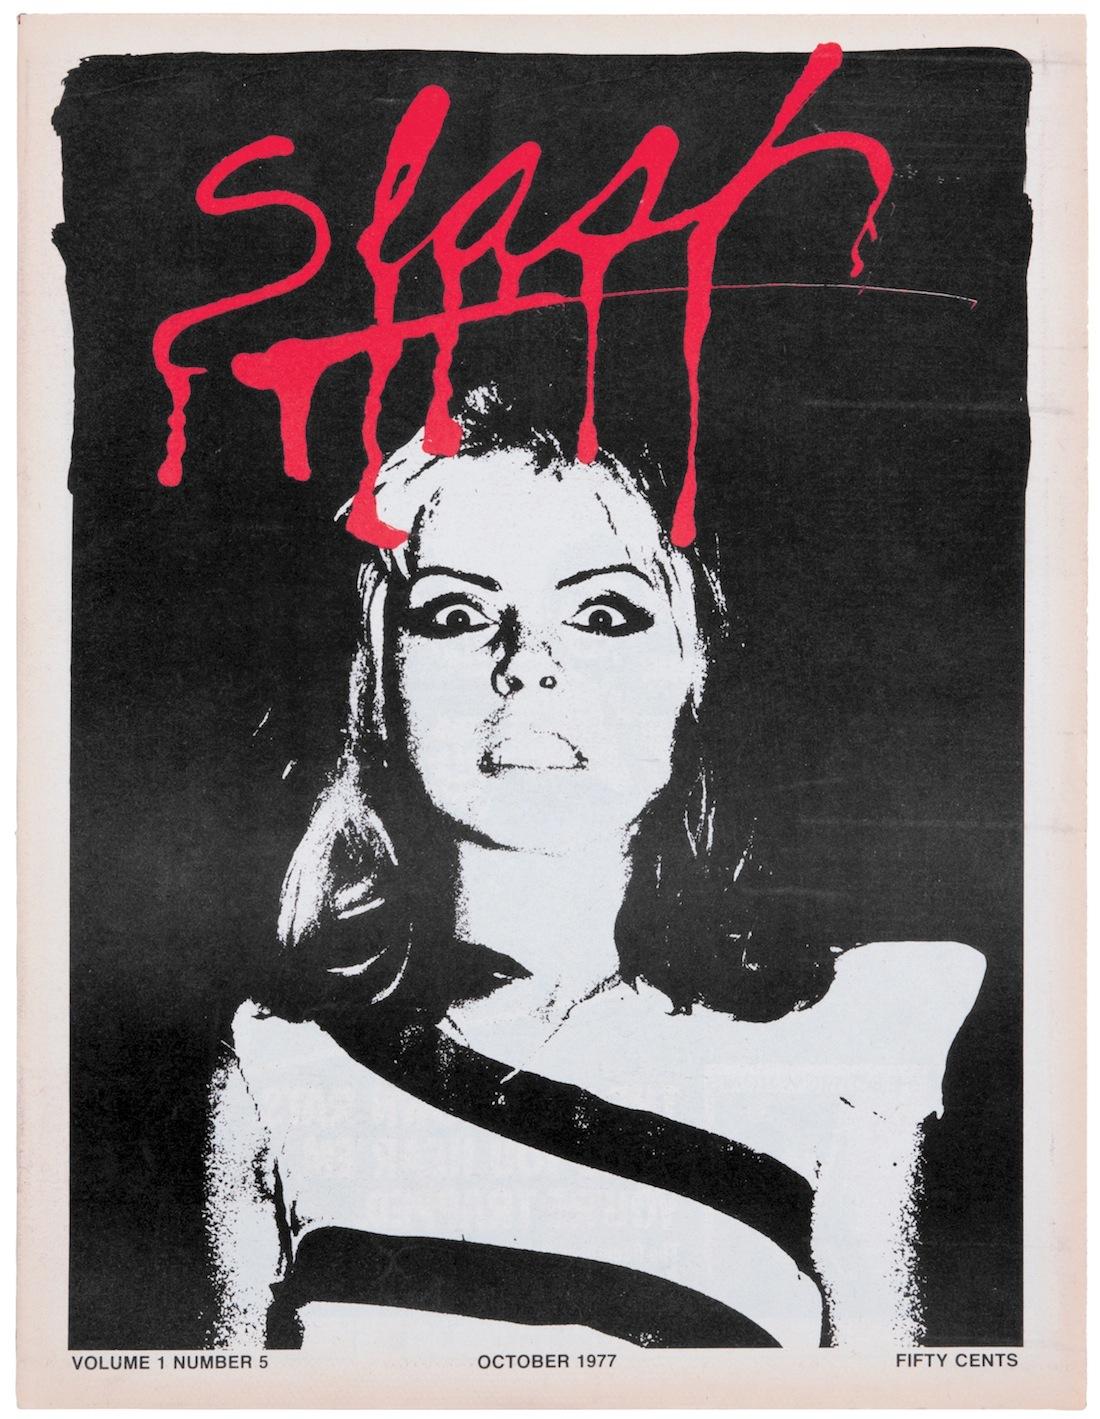 the-wild-diy-style-of-las-late-70s-punk-scene-body-image-1469203814.jpg